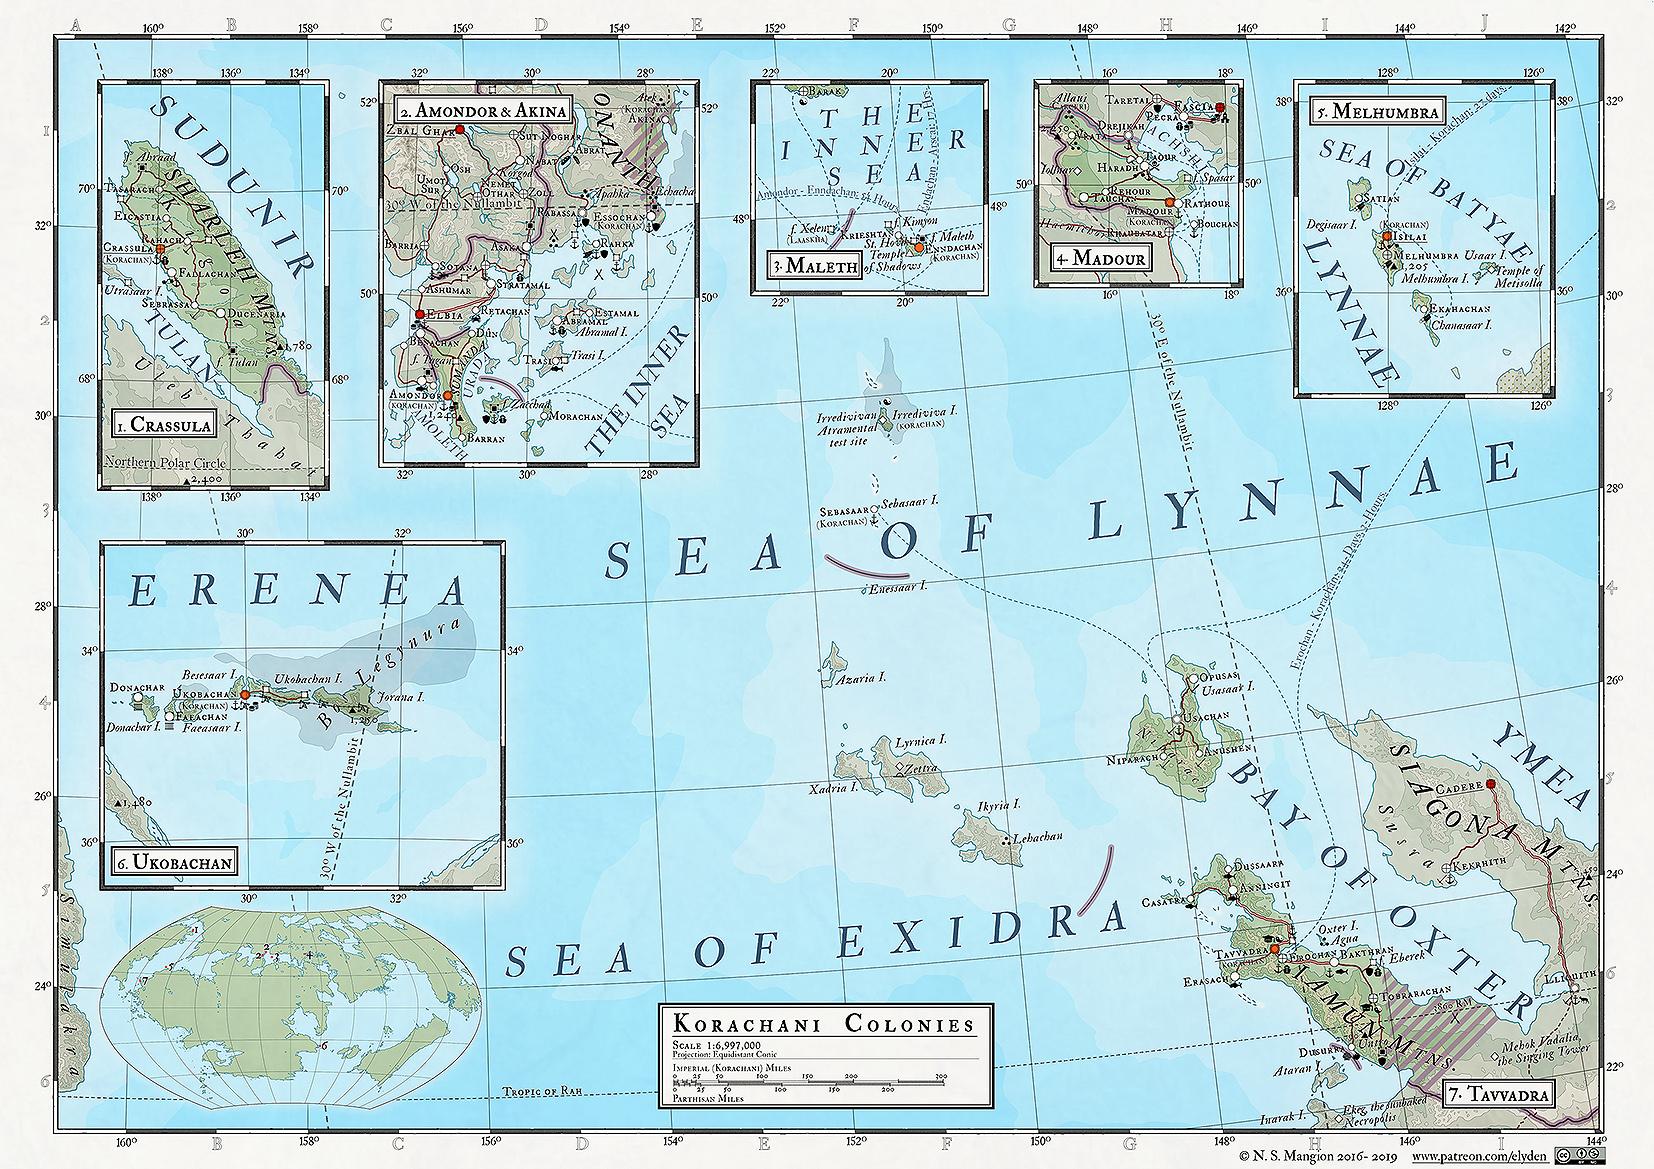 50 - Korachani colonies